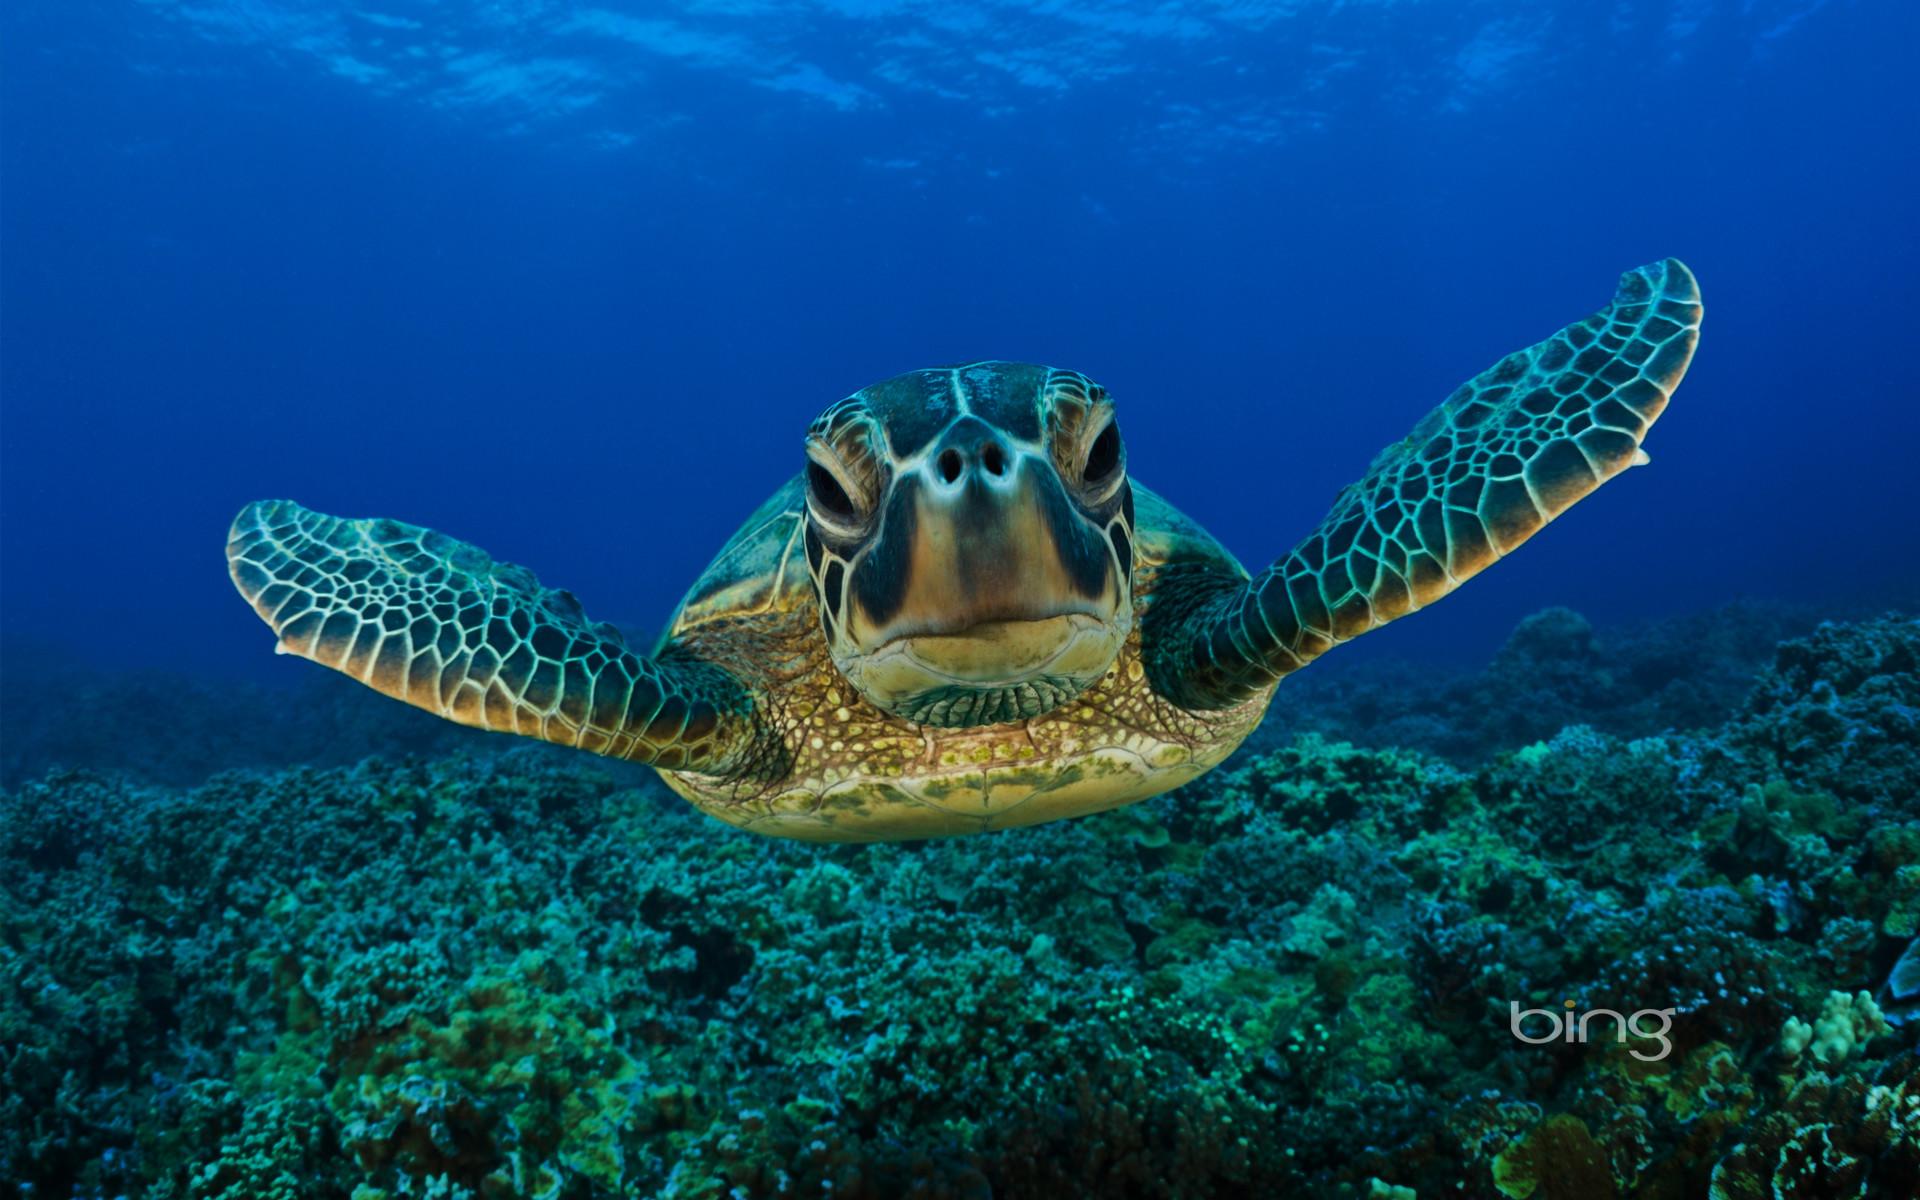 Free Hug A Sea Turtle Wallpapers, Free Hug A Sea Turtle HD Wallpapers .